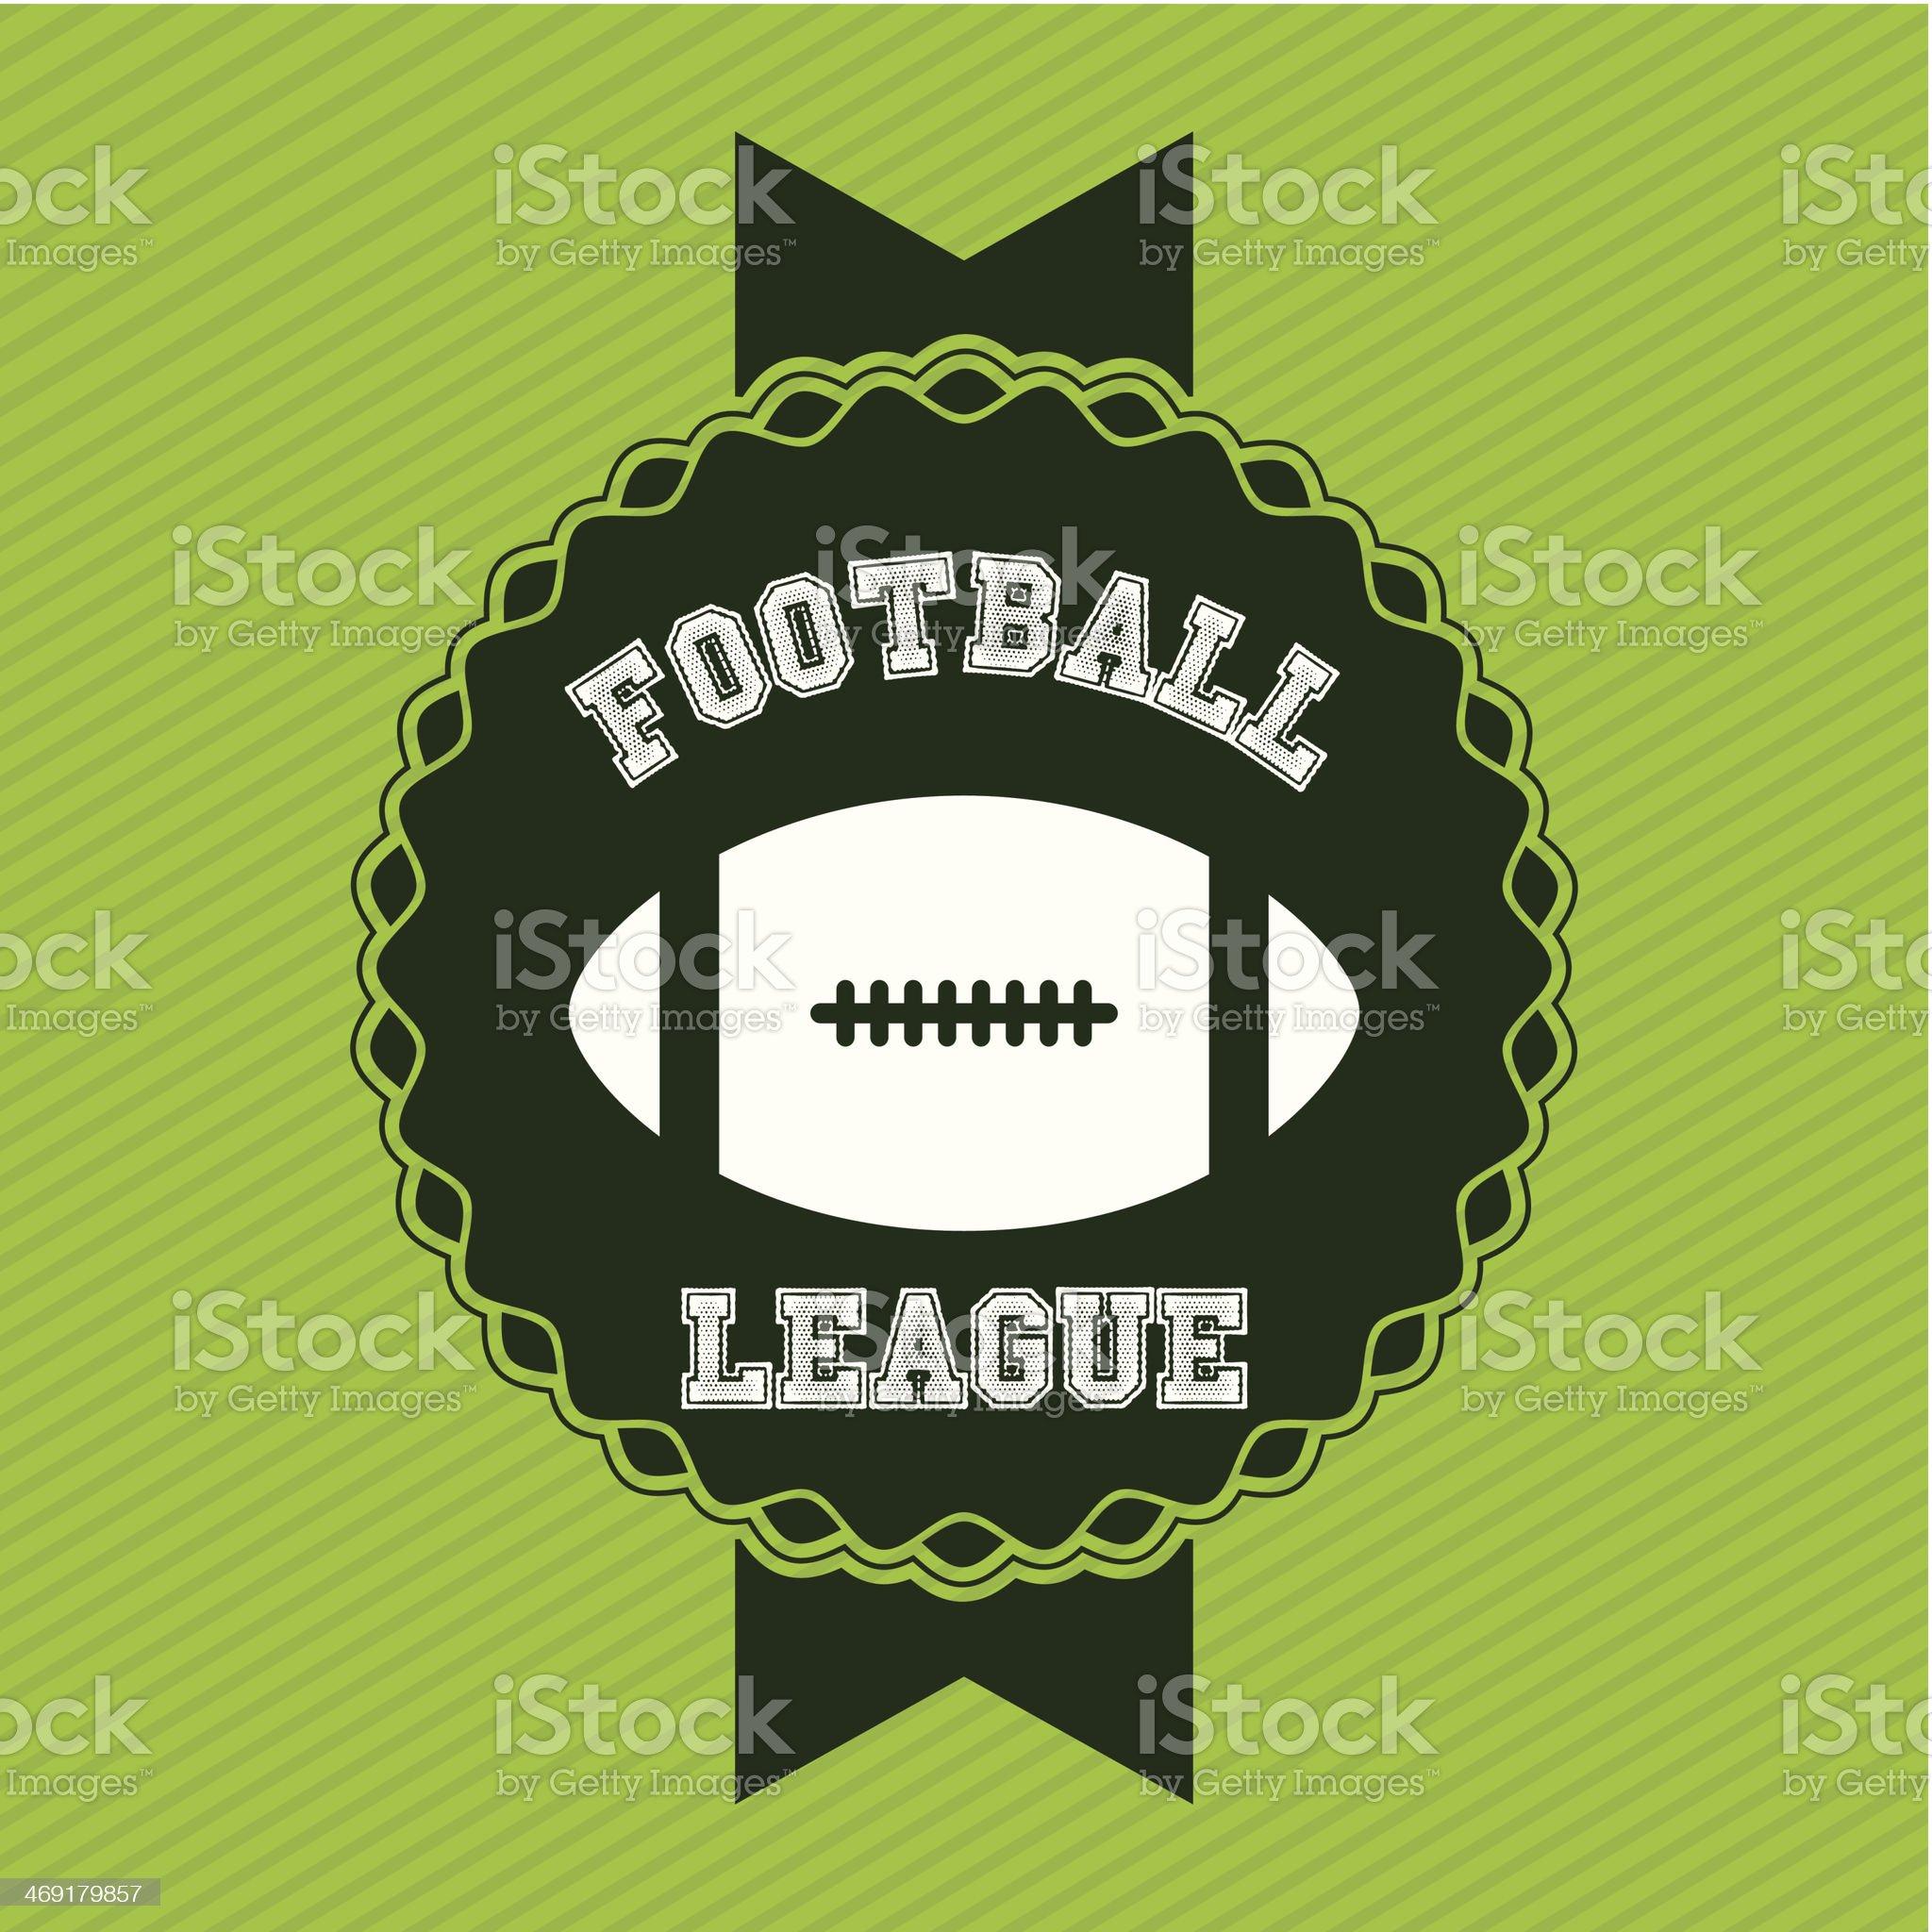 American Football royalty-free stock vector art